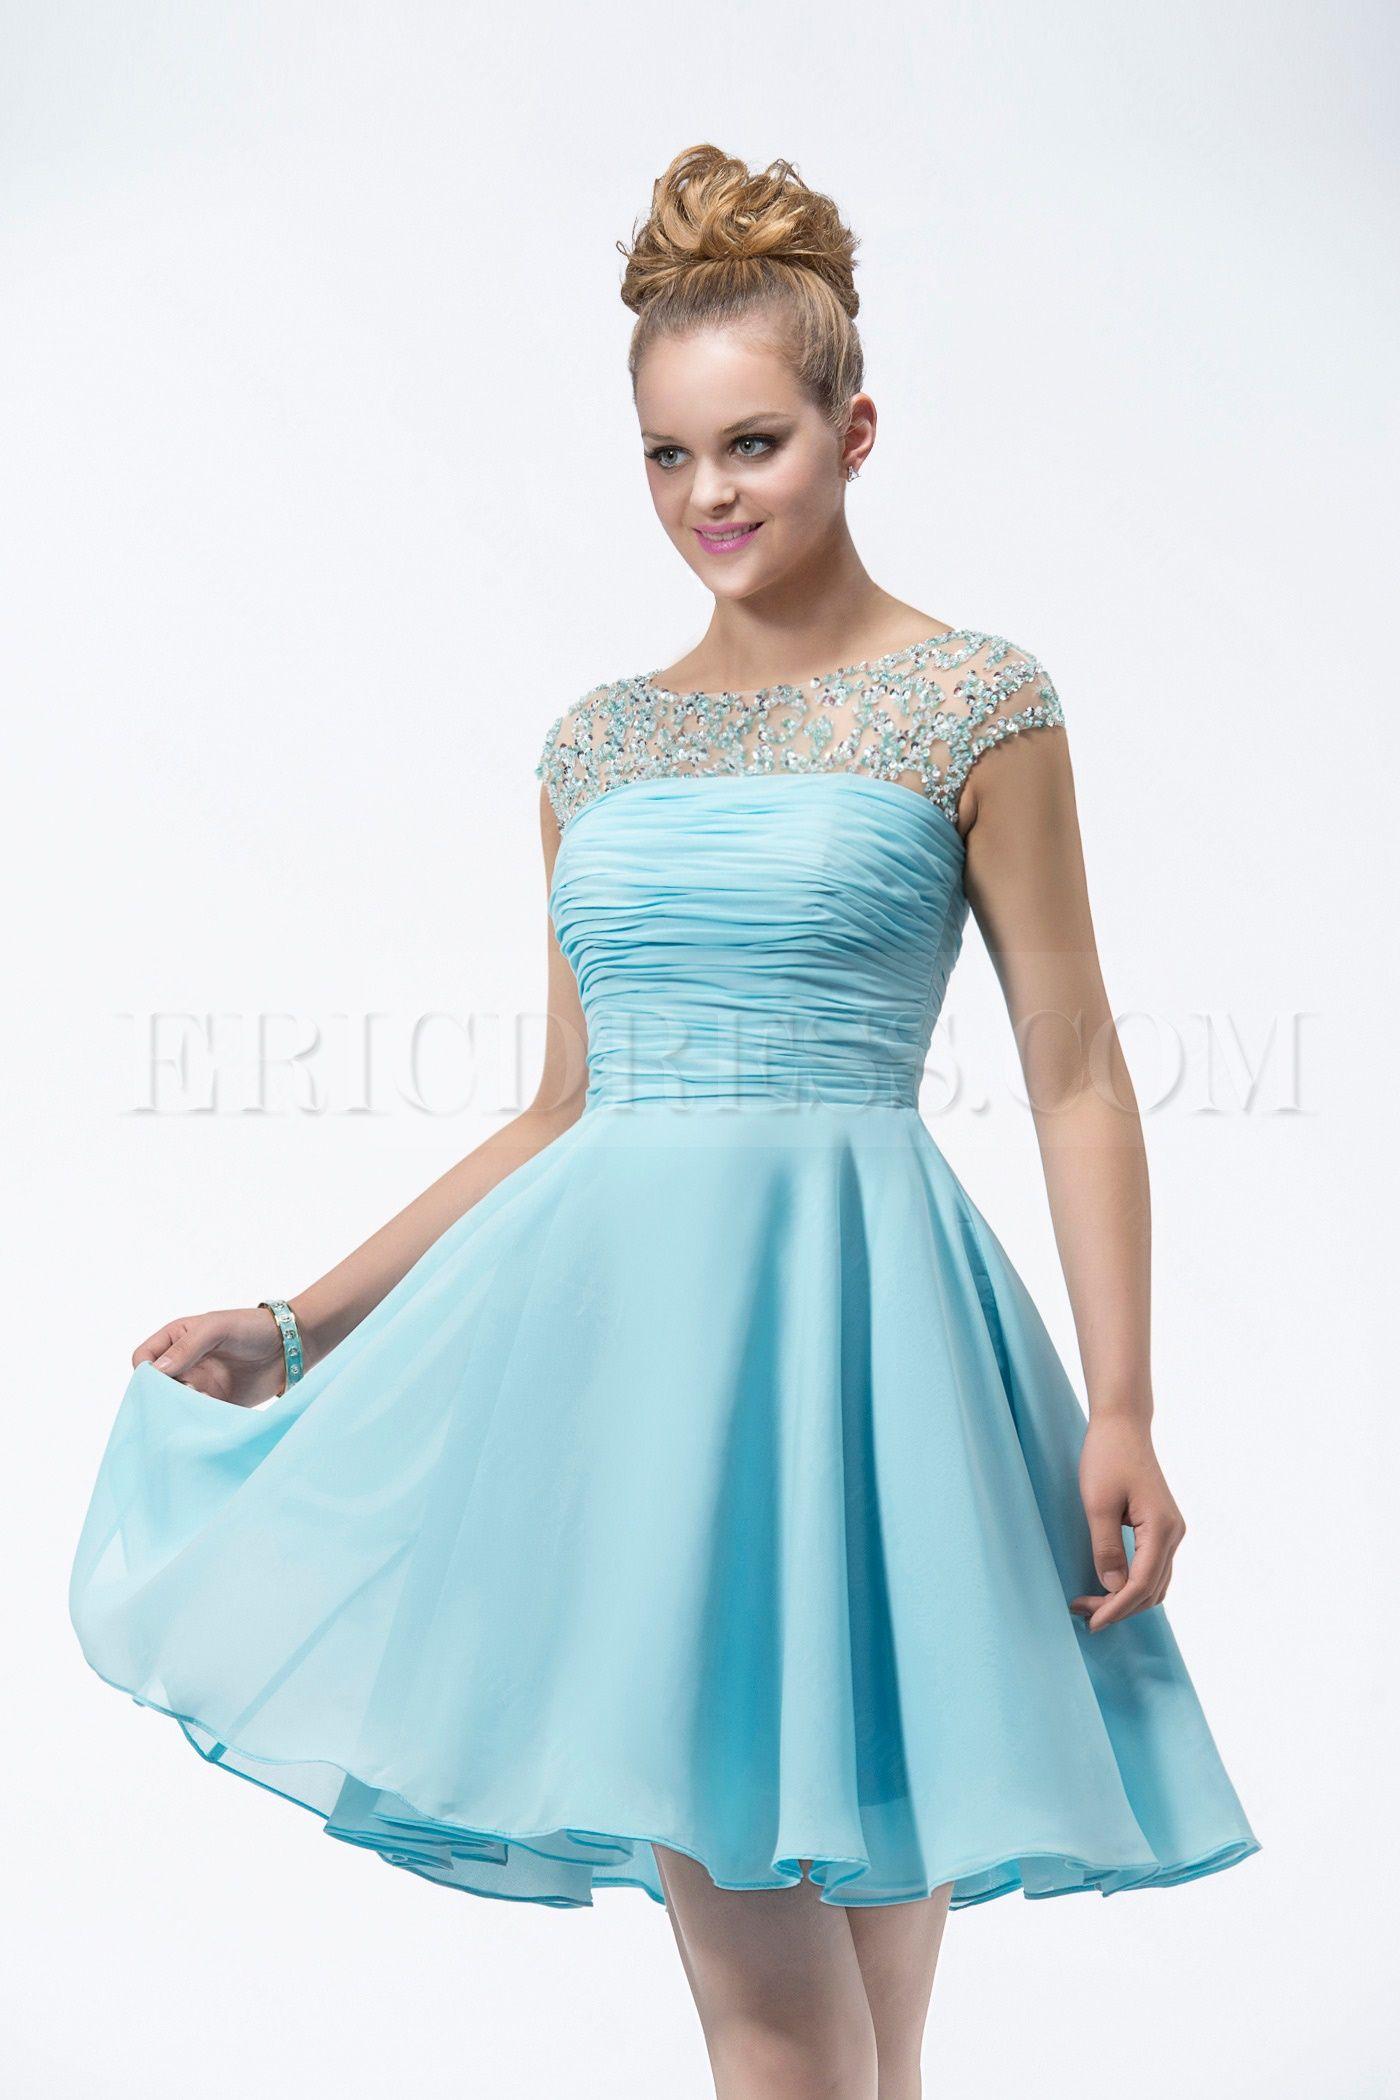 vestidos 15 cortos hielo - Buscar con Google | Dresses | Pinterest ...